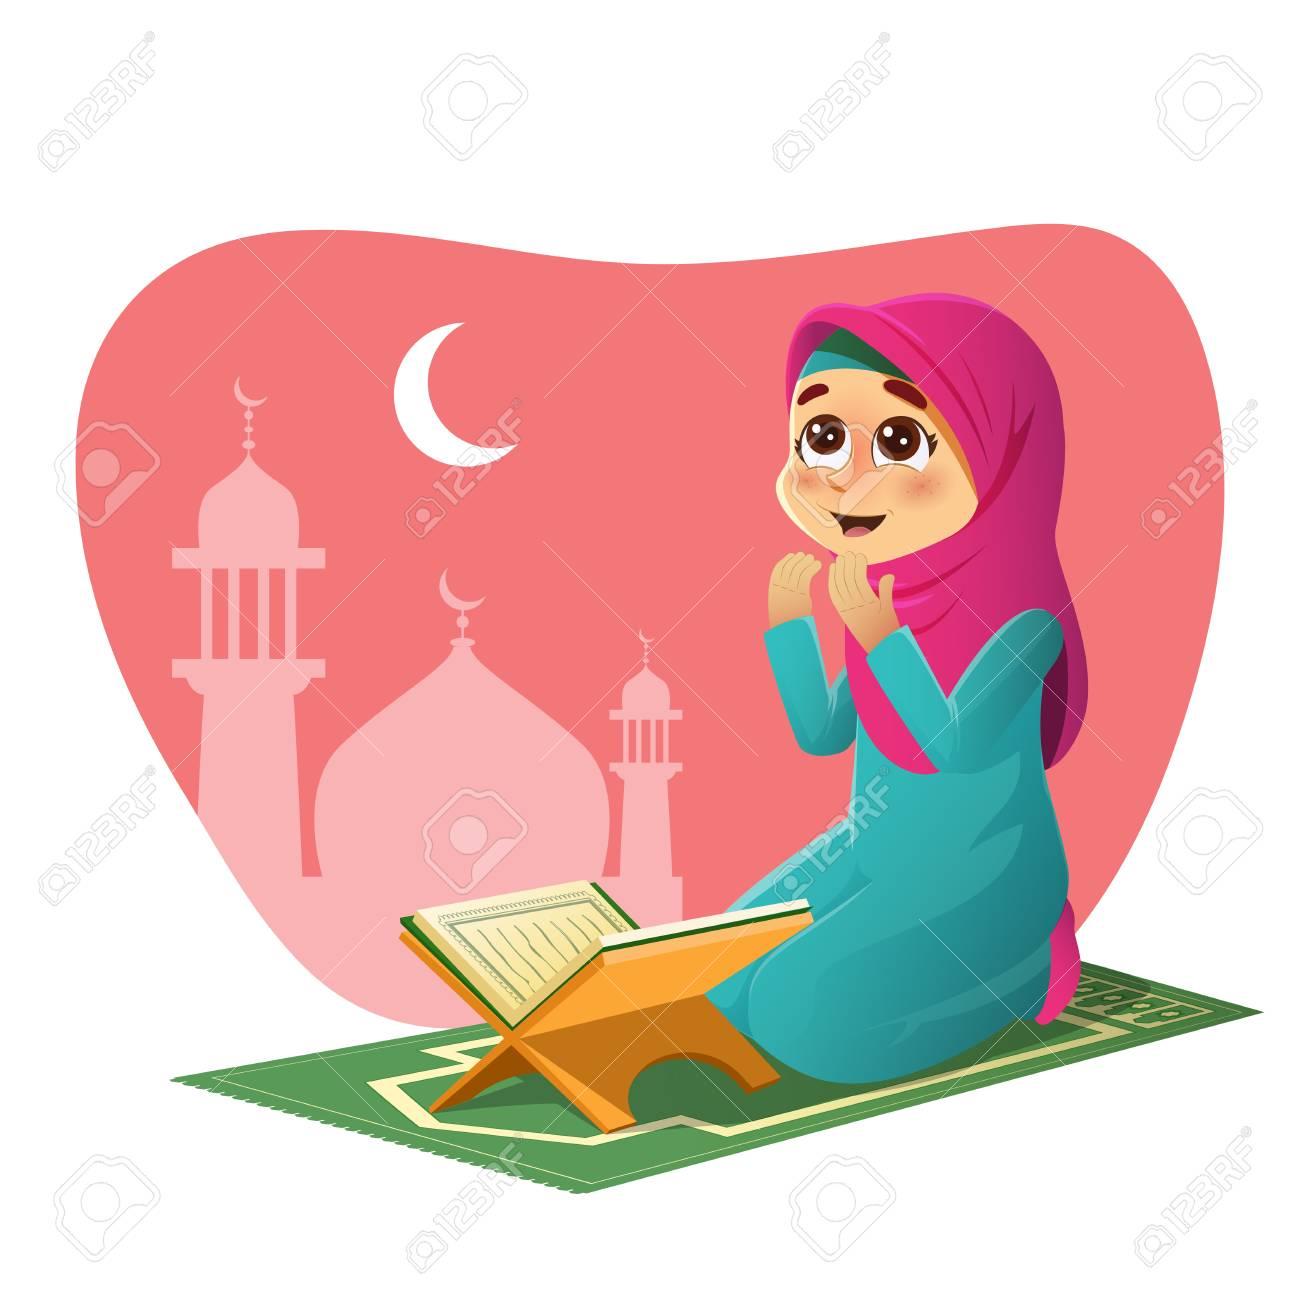 Muslim Girl Praying vector illustration.